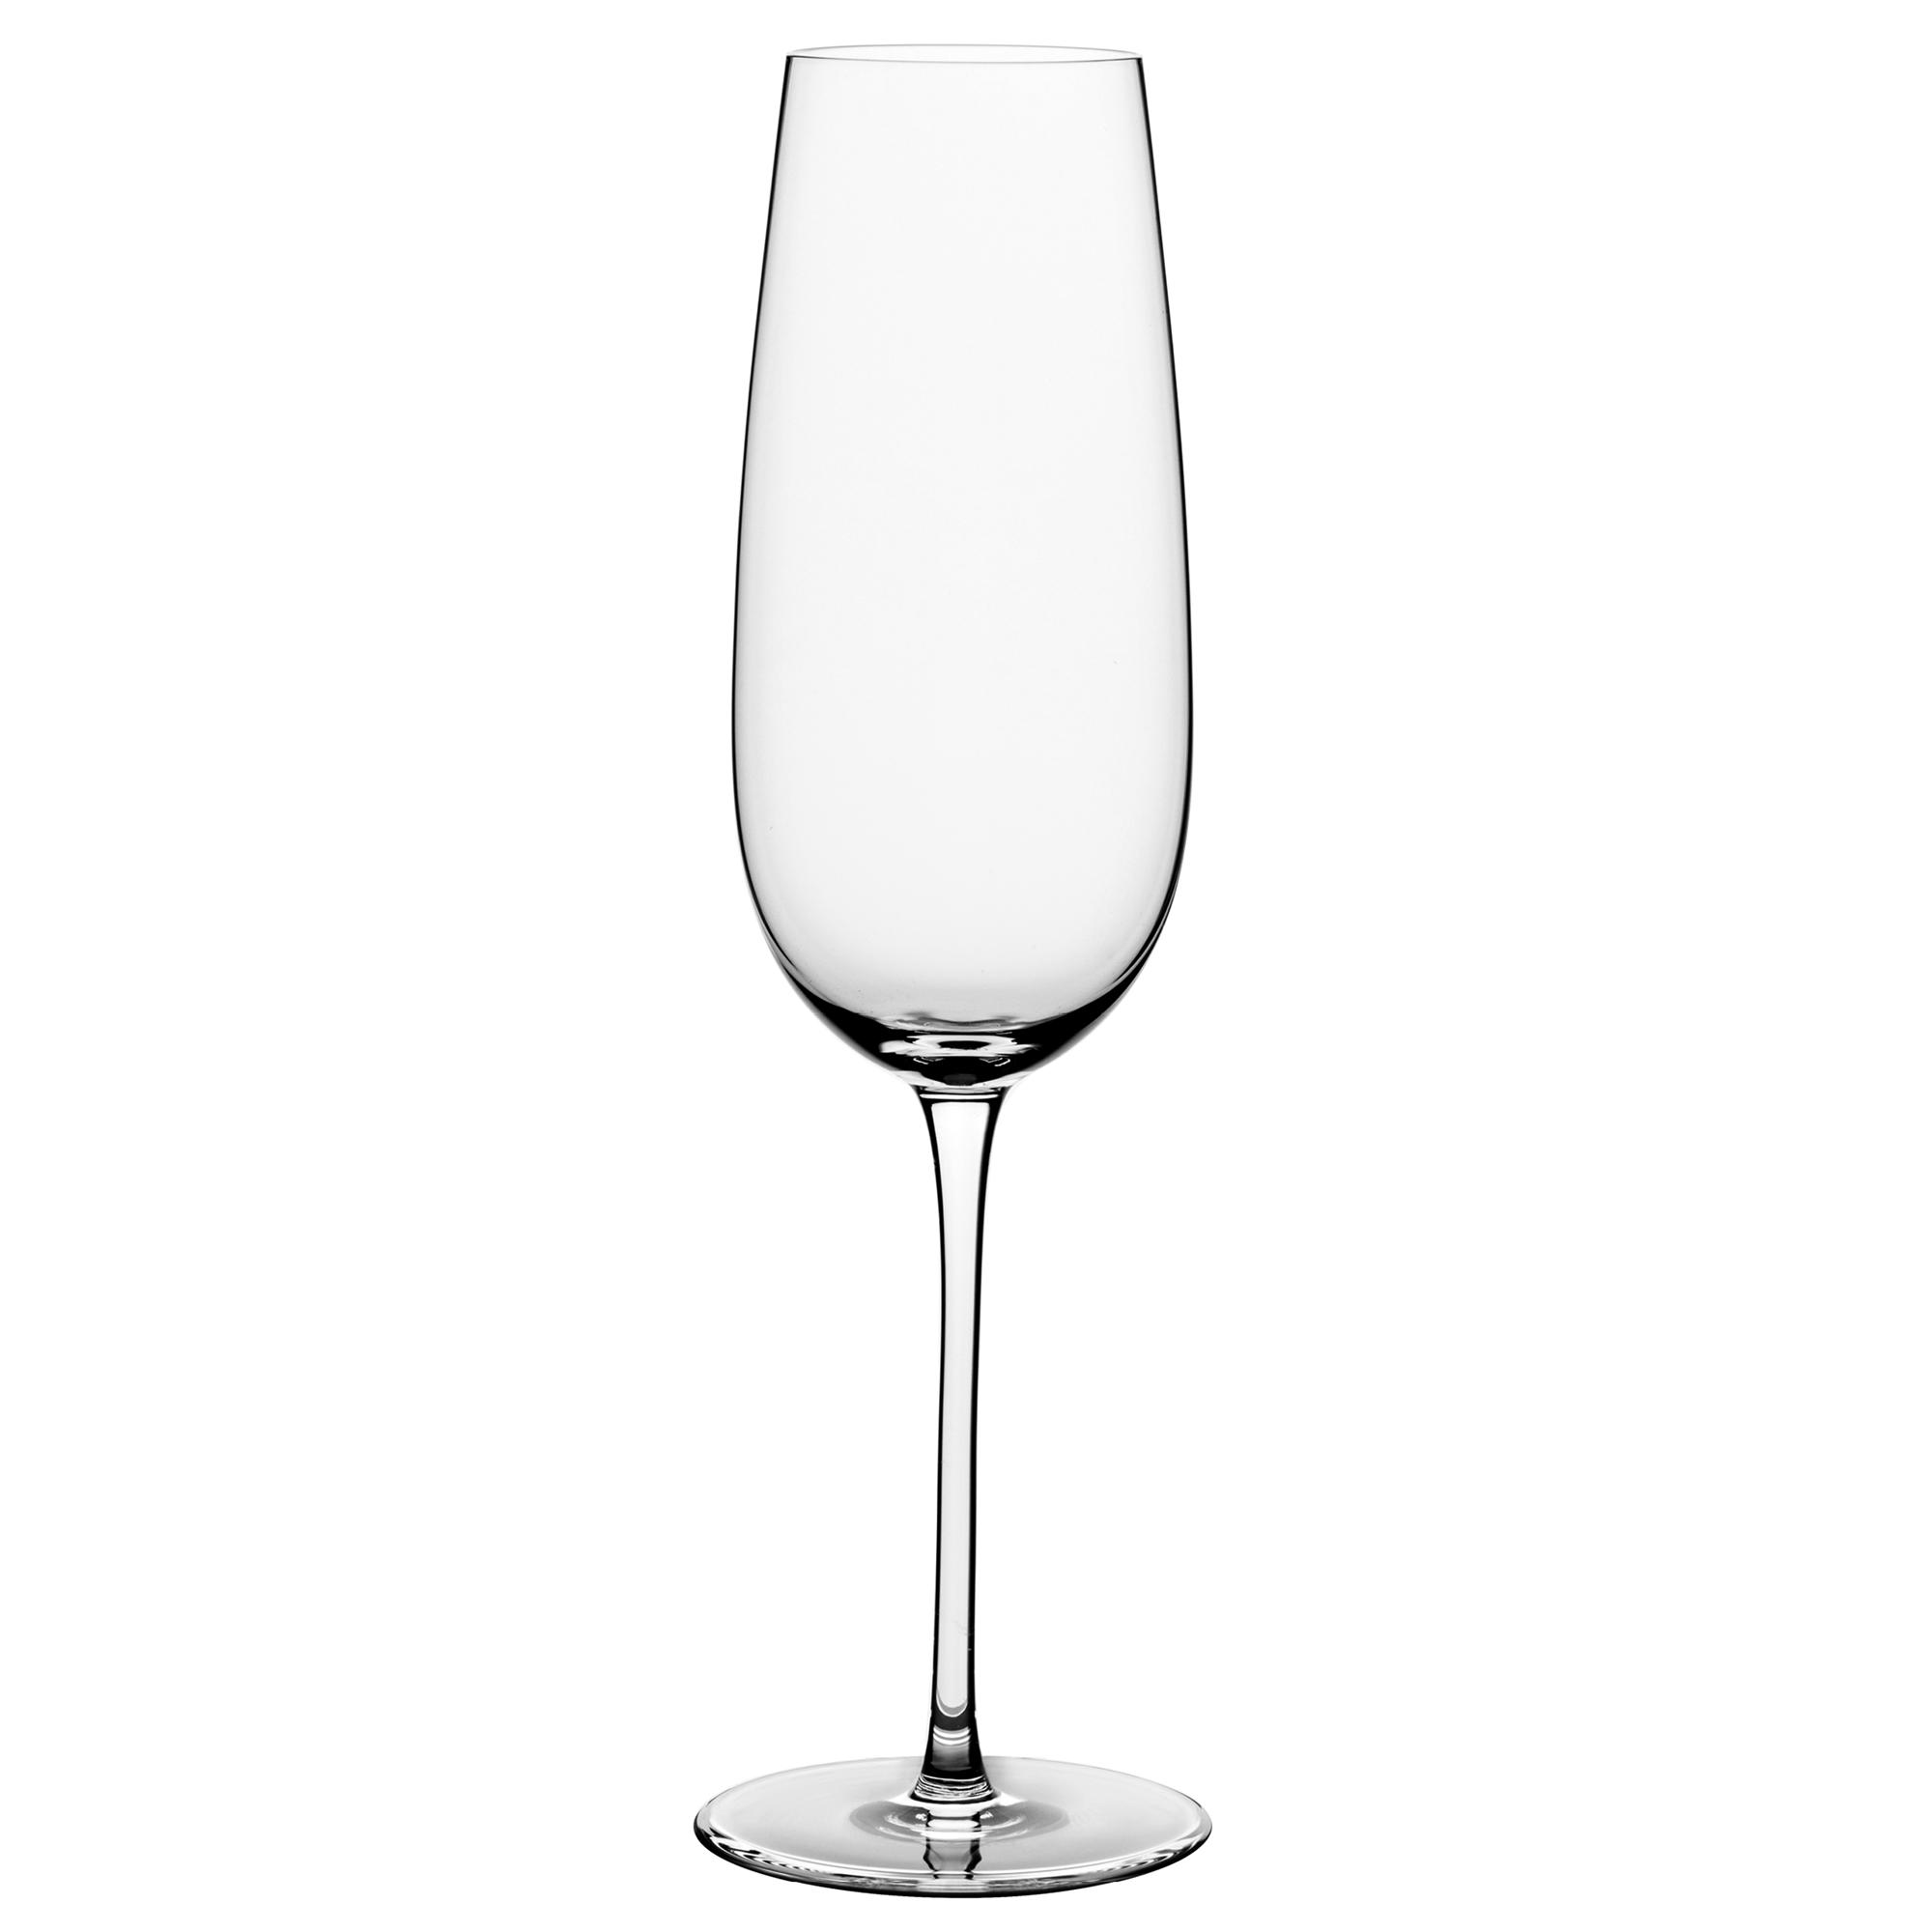 olga cassini long stem champagne flutes - HD2000×2000